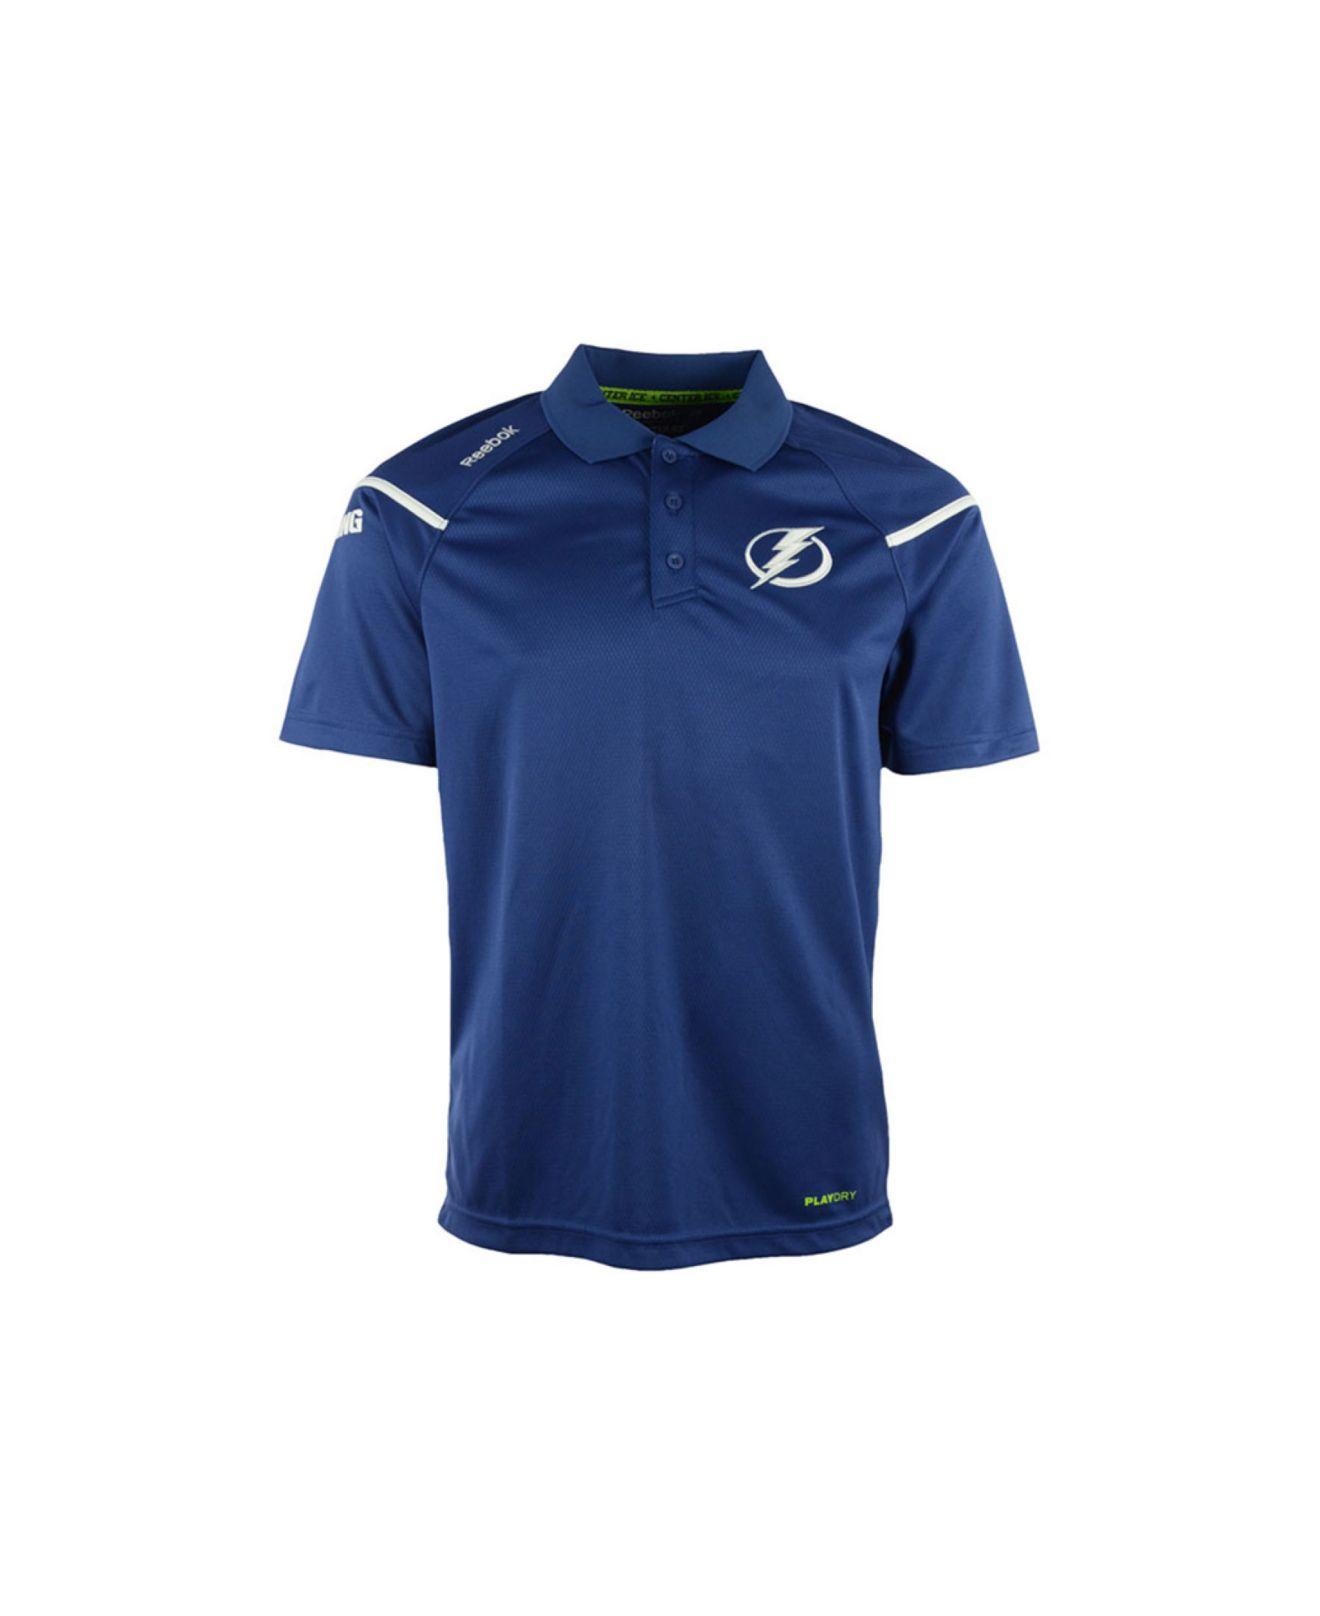 ad6ca030 Reebok Blue Men'S Tampa Bay Lightning Center Ice Polo Shirt for men